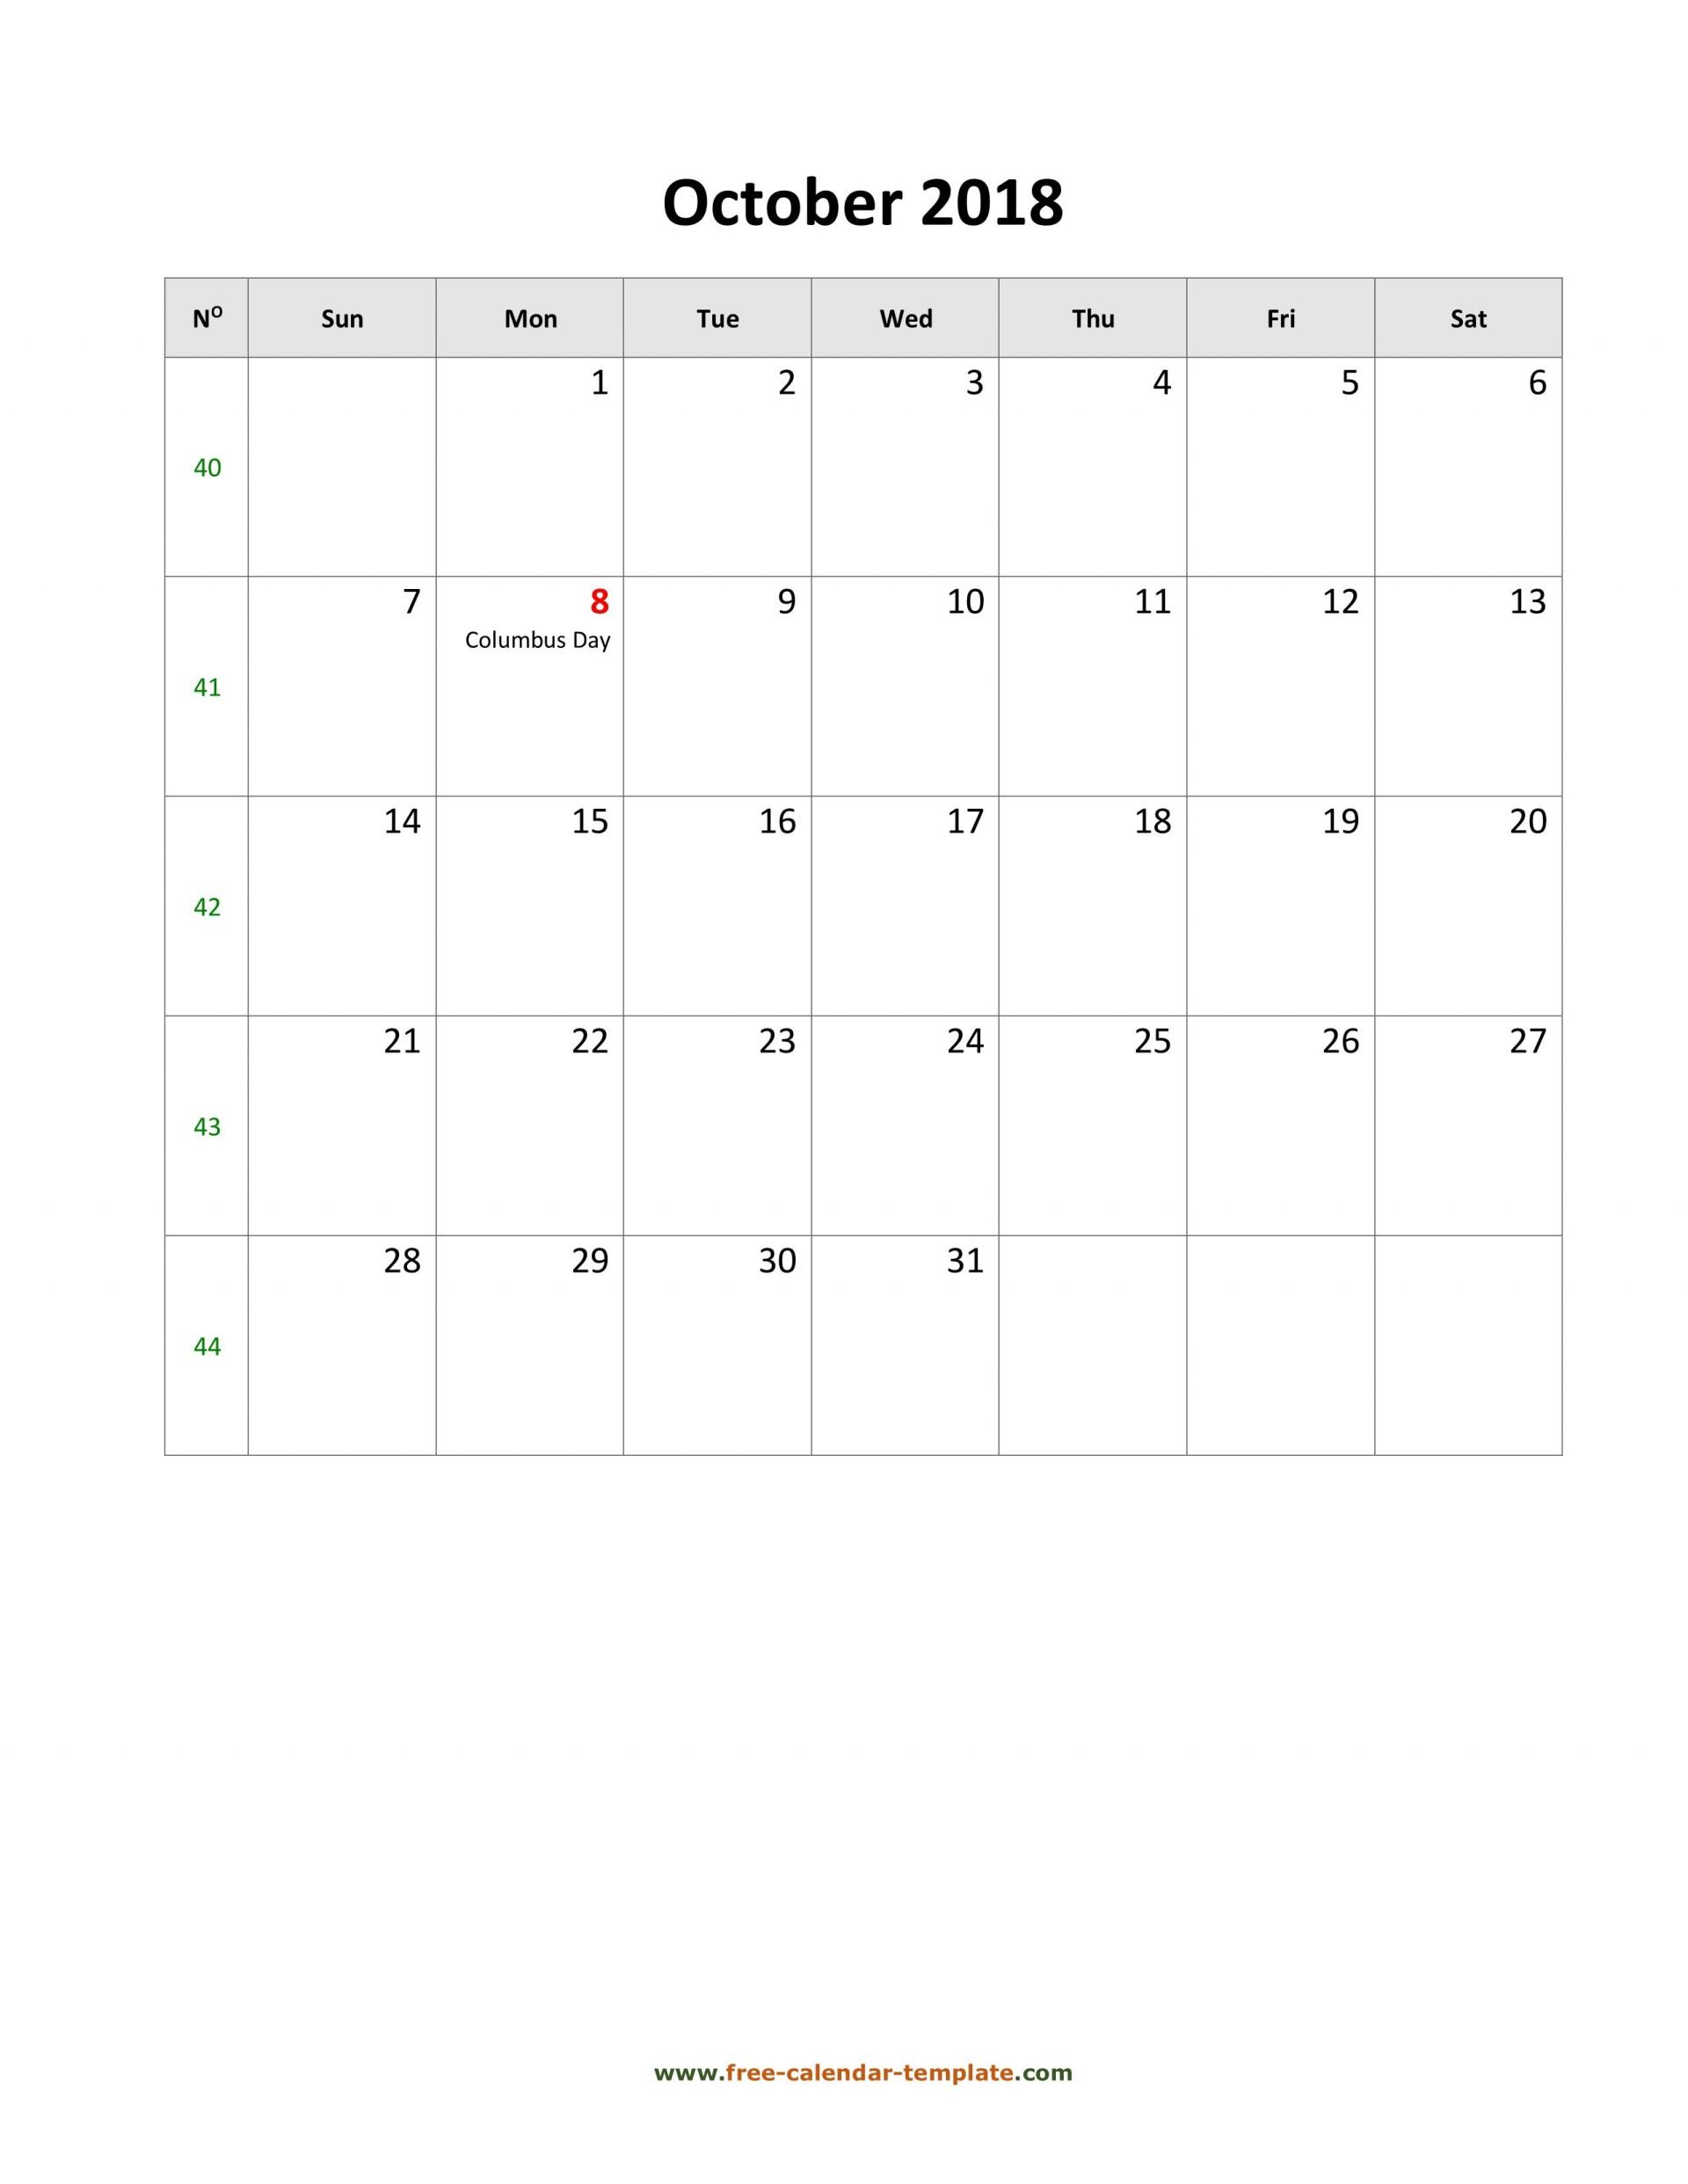 009 Staggering Calendar Template October 2018 Word Design 1920